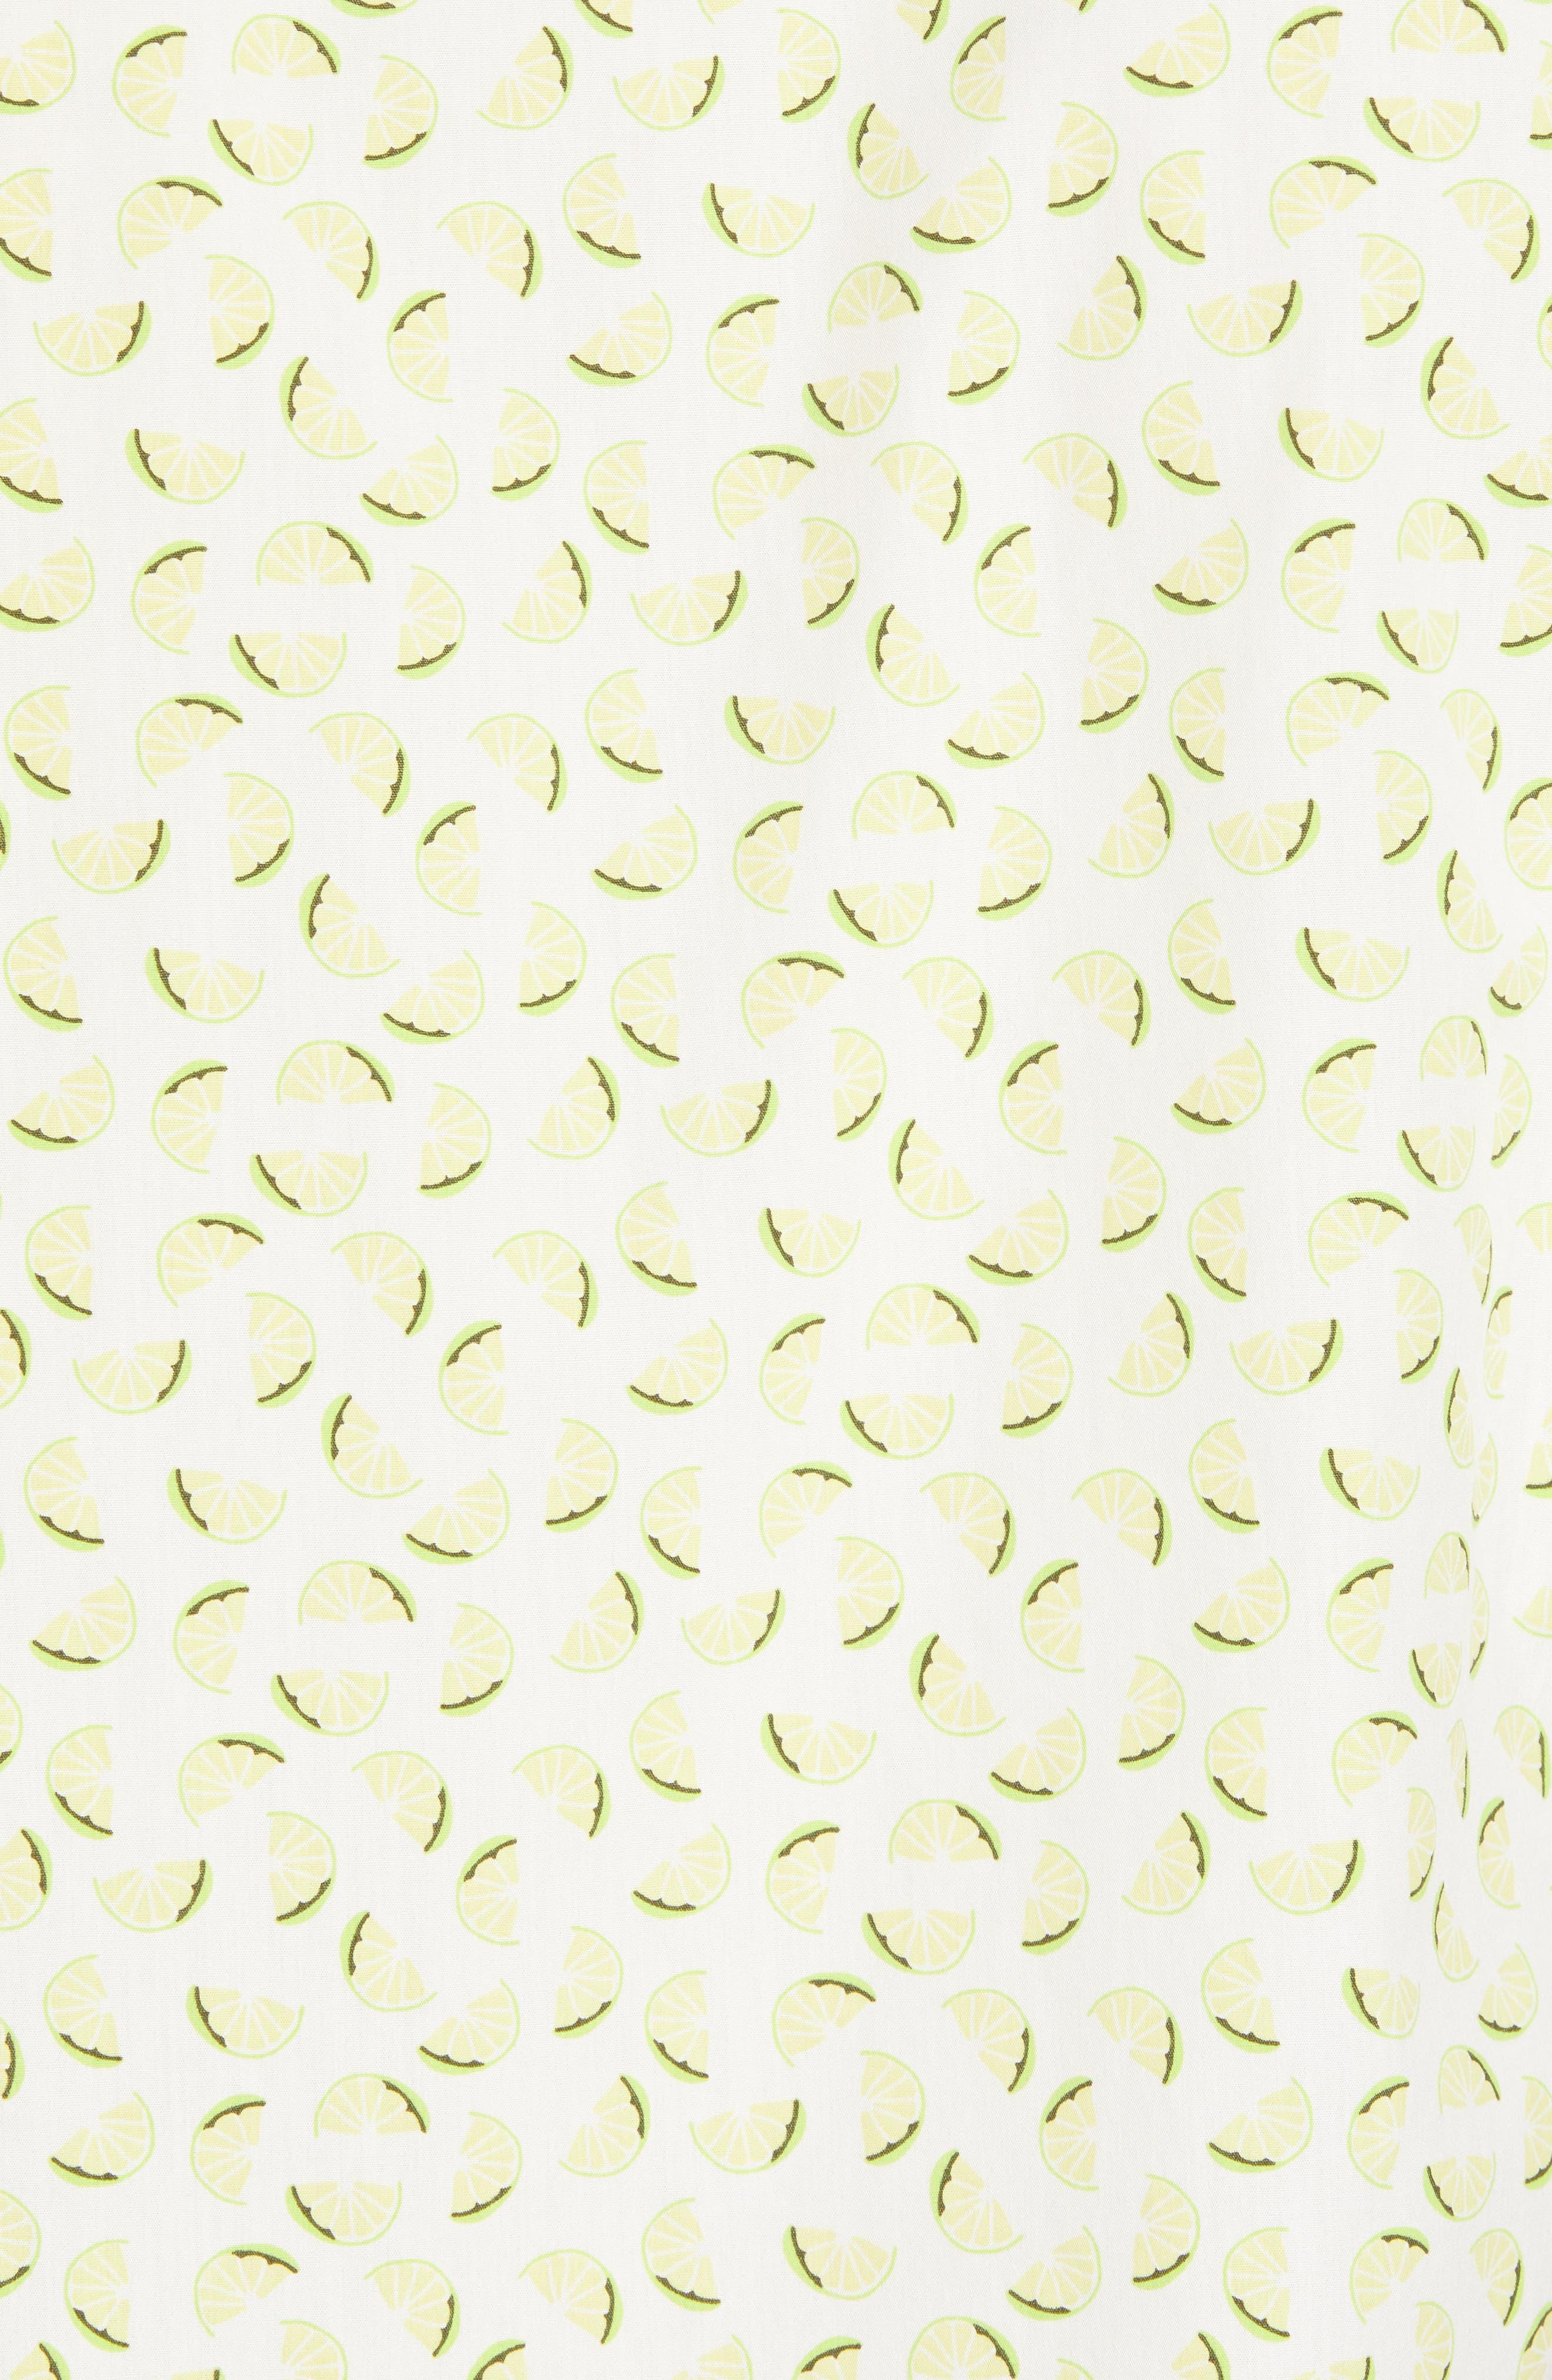 Slim Fit Citrus Print Sport Shirt,                             Alternate thumbnail 5, color,                             Lemon Toss - Acid Lime